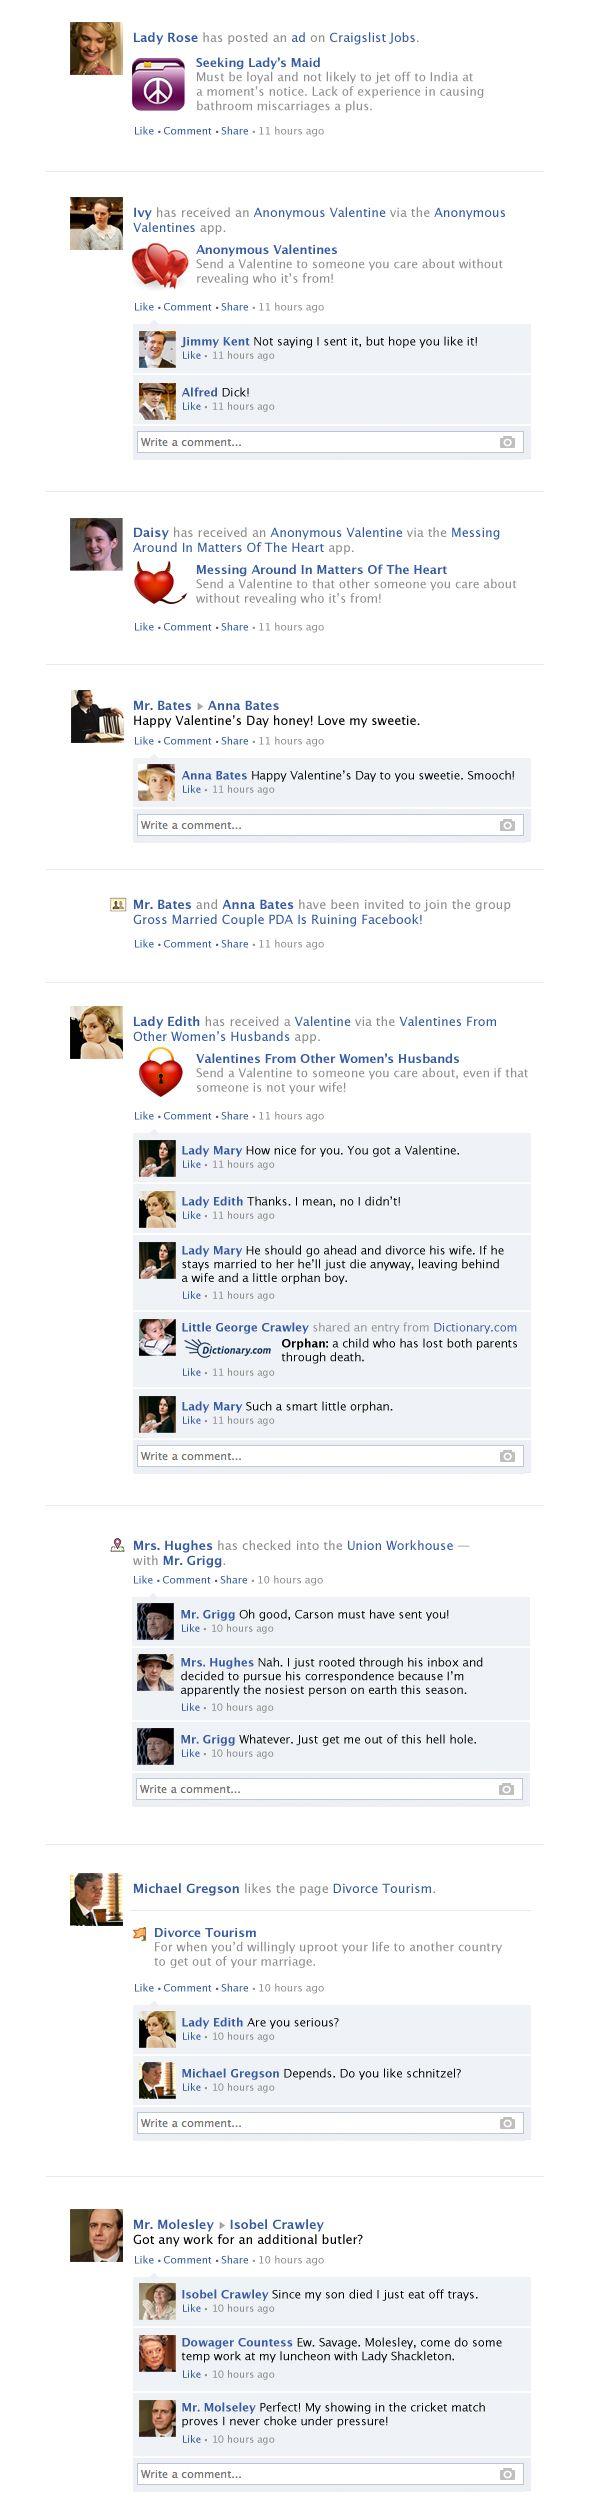 Downton Abbey Facebook Recap - Season 4, Episode 1 | Happy Place